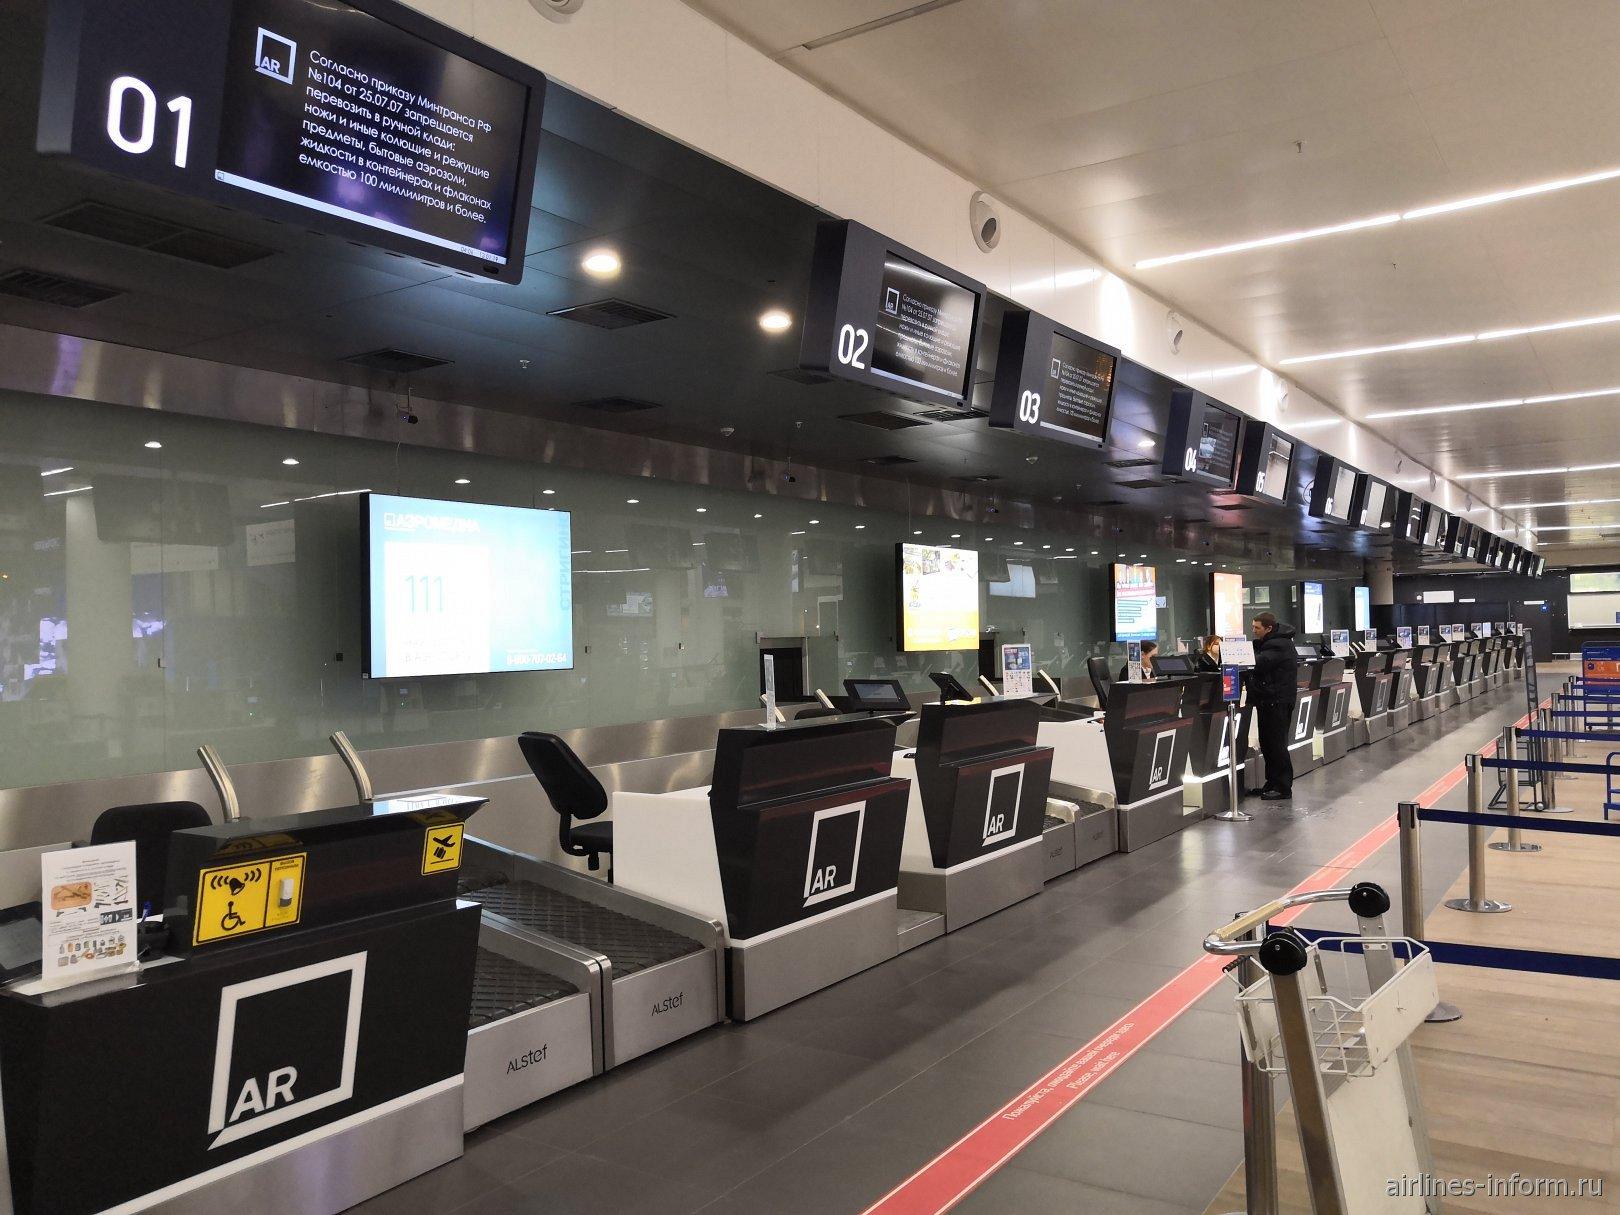 Стойки регистрации в аэропорту Нижний Новгород Стригино